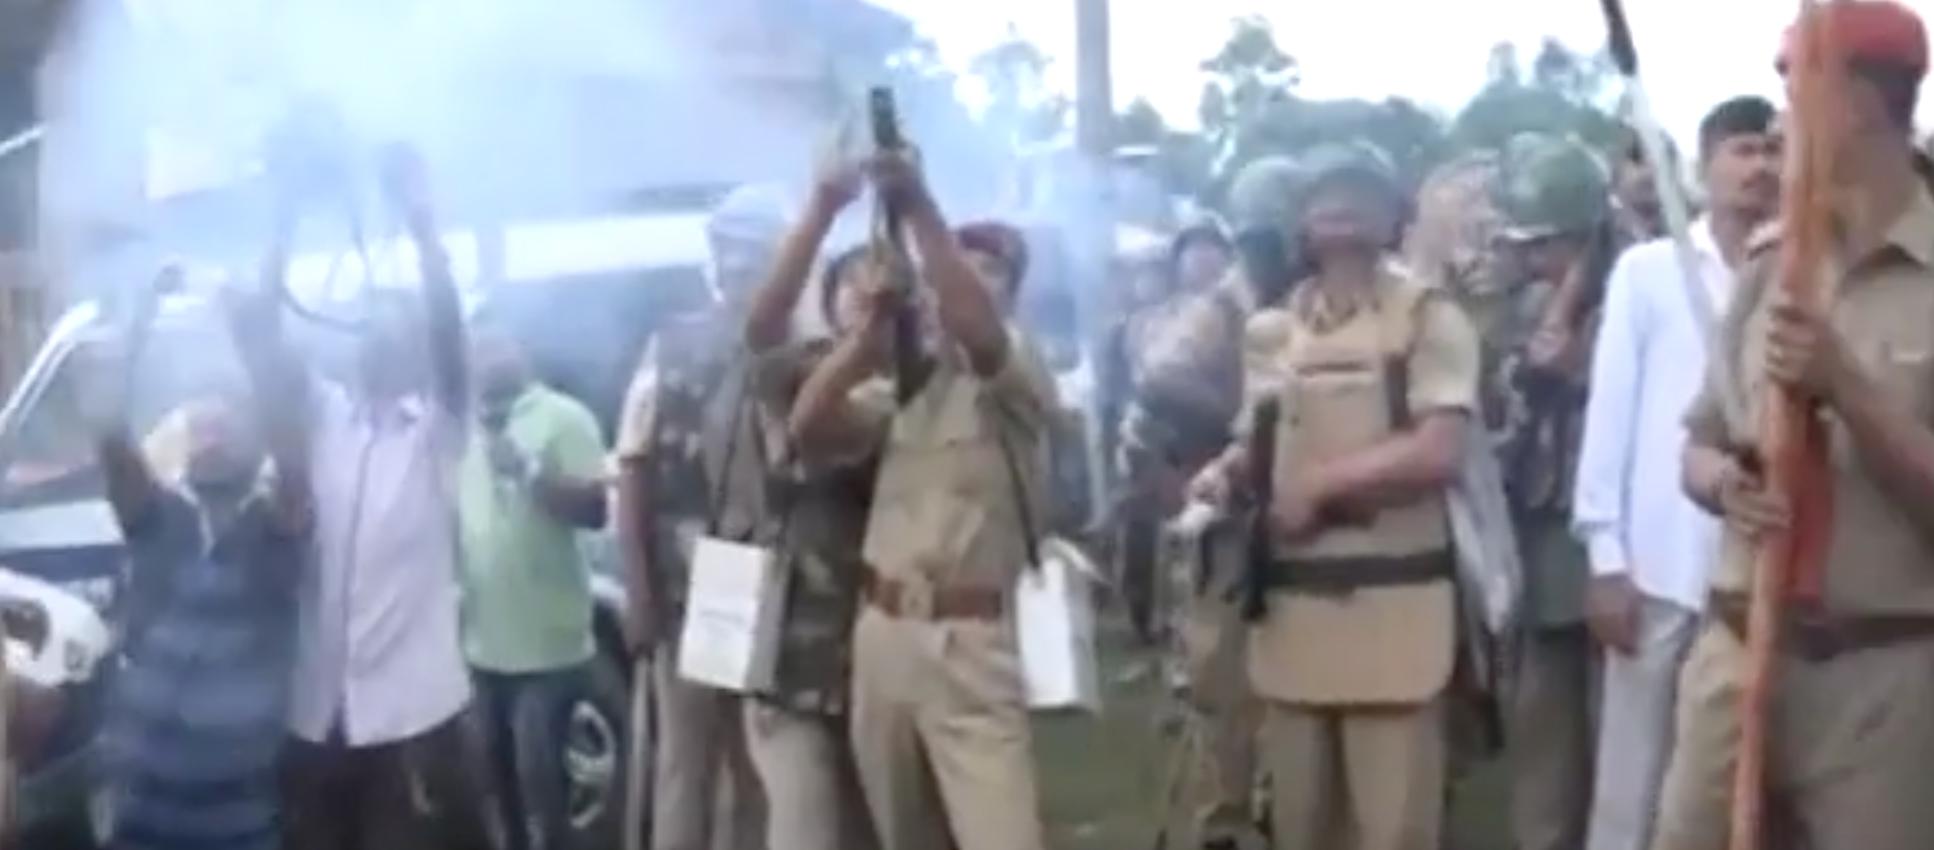 Two Killed in Police Firing Near Kaziranga, Eyewitnesses Say